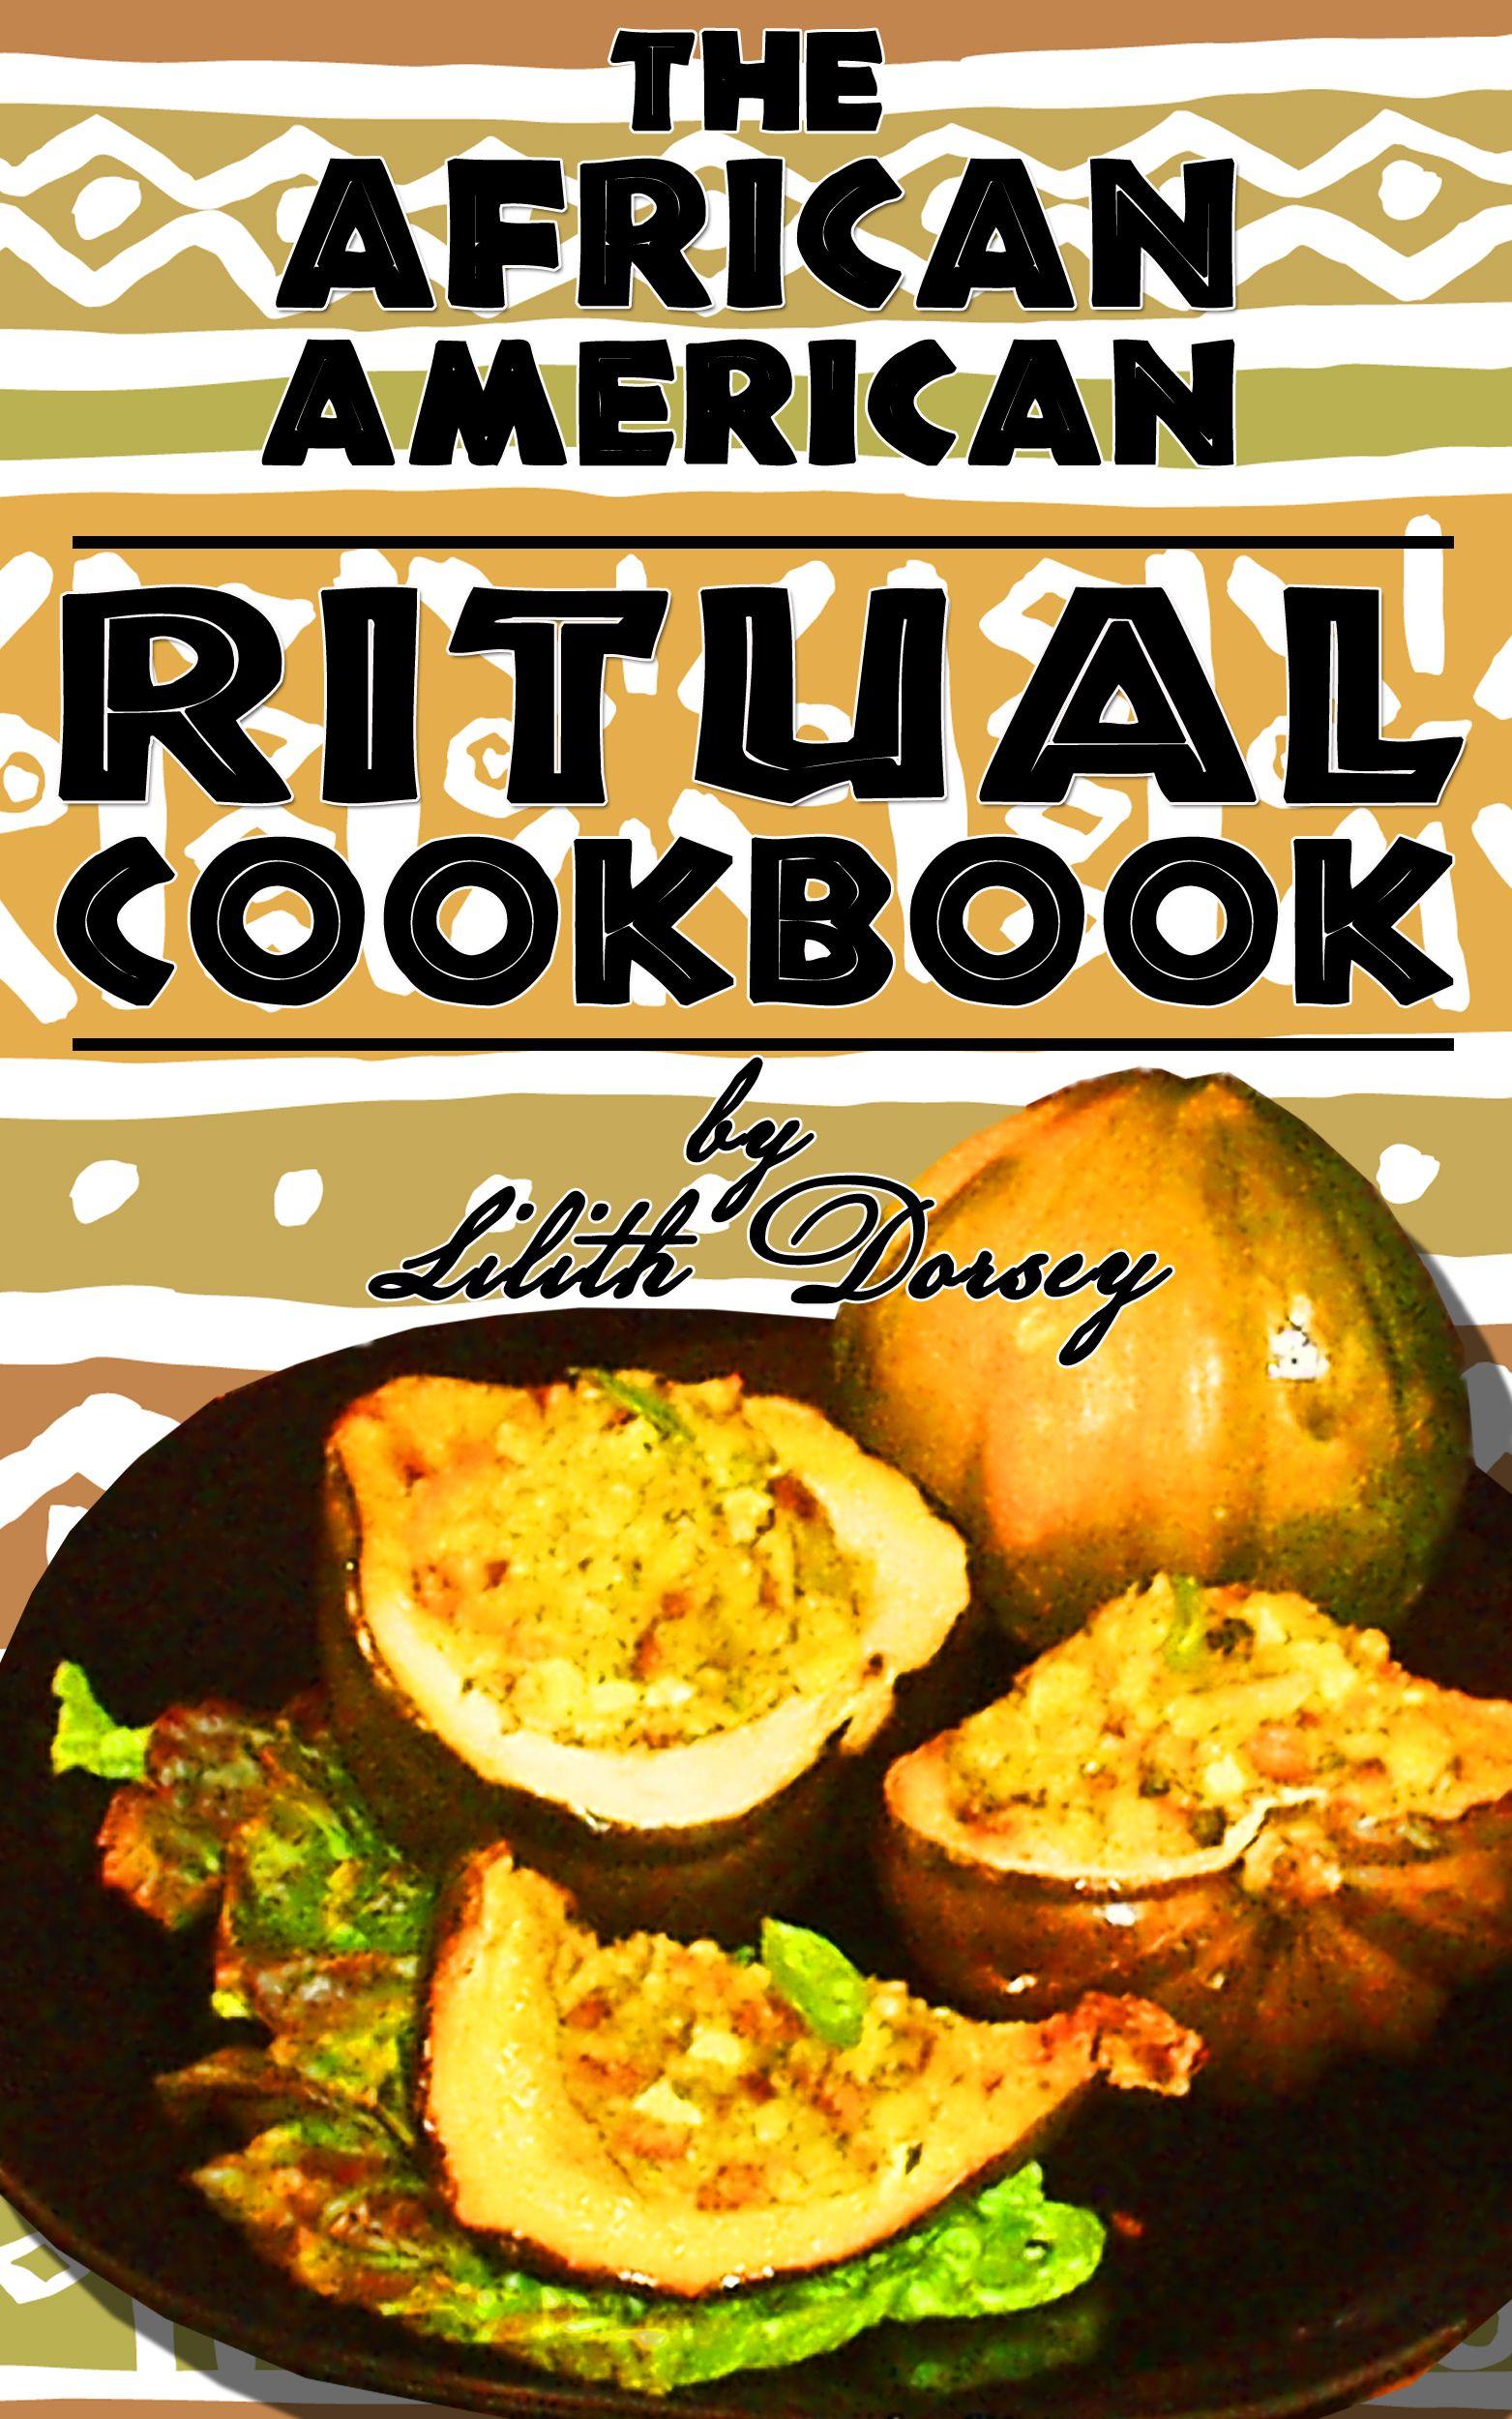 Africanamerican ritual cookbook soul food cookbook